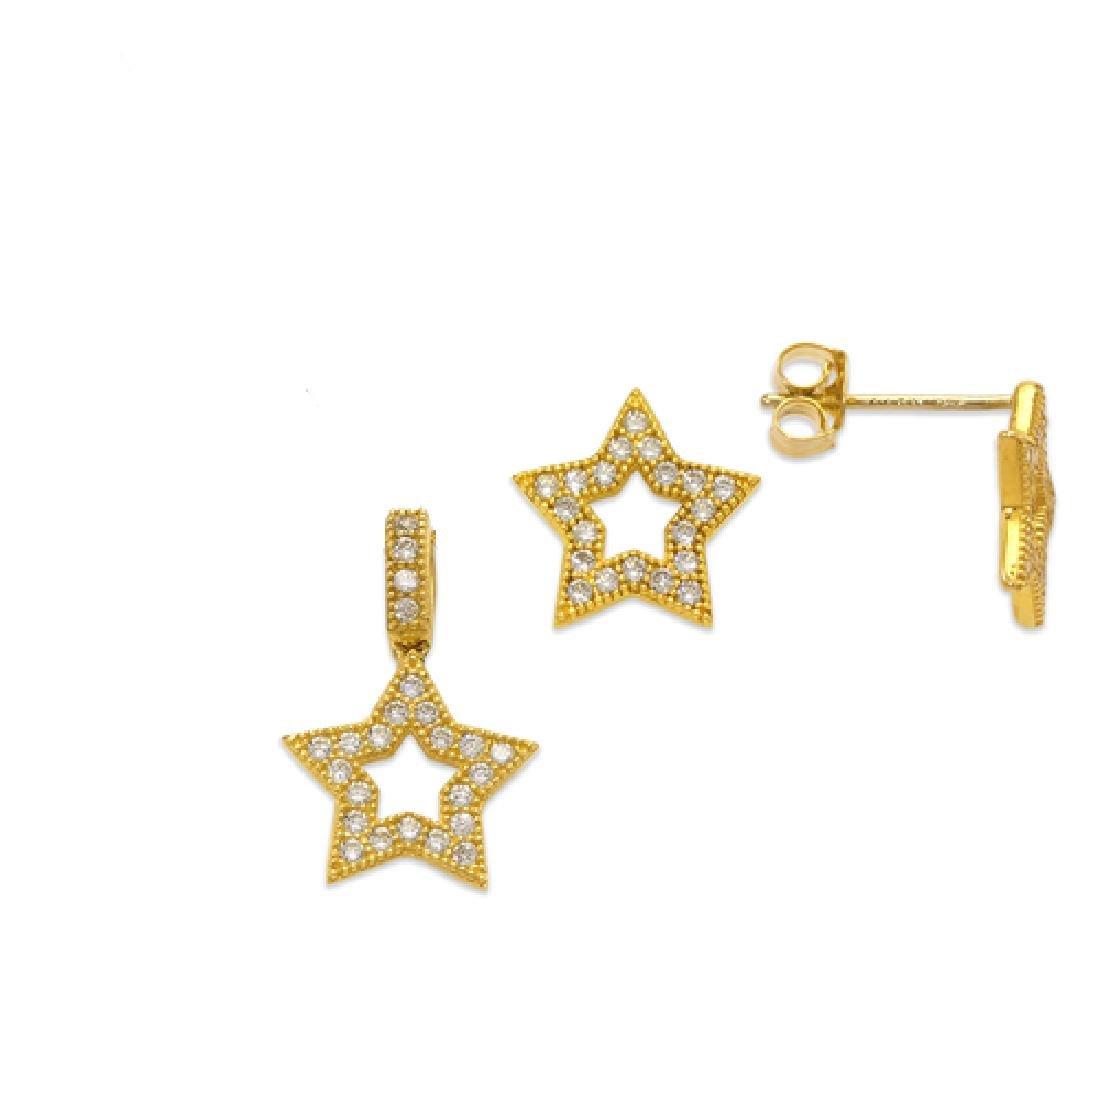 NEW 14K YELLOW GOLD STAR EARRING PENDANT SET - 2